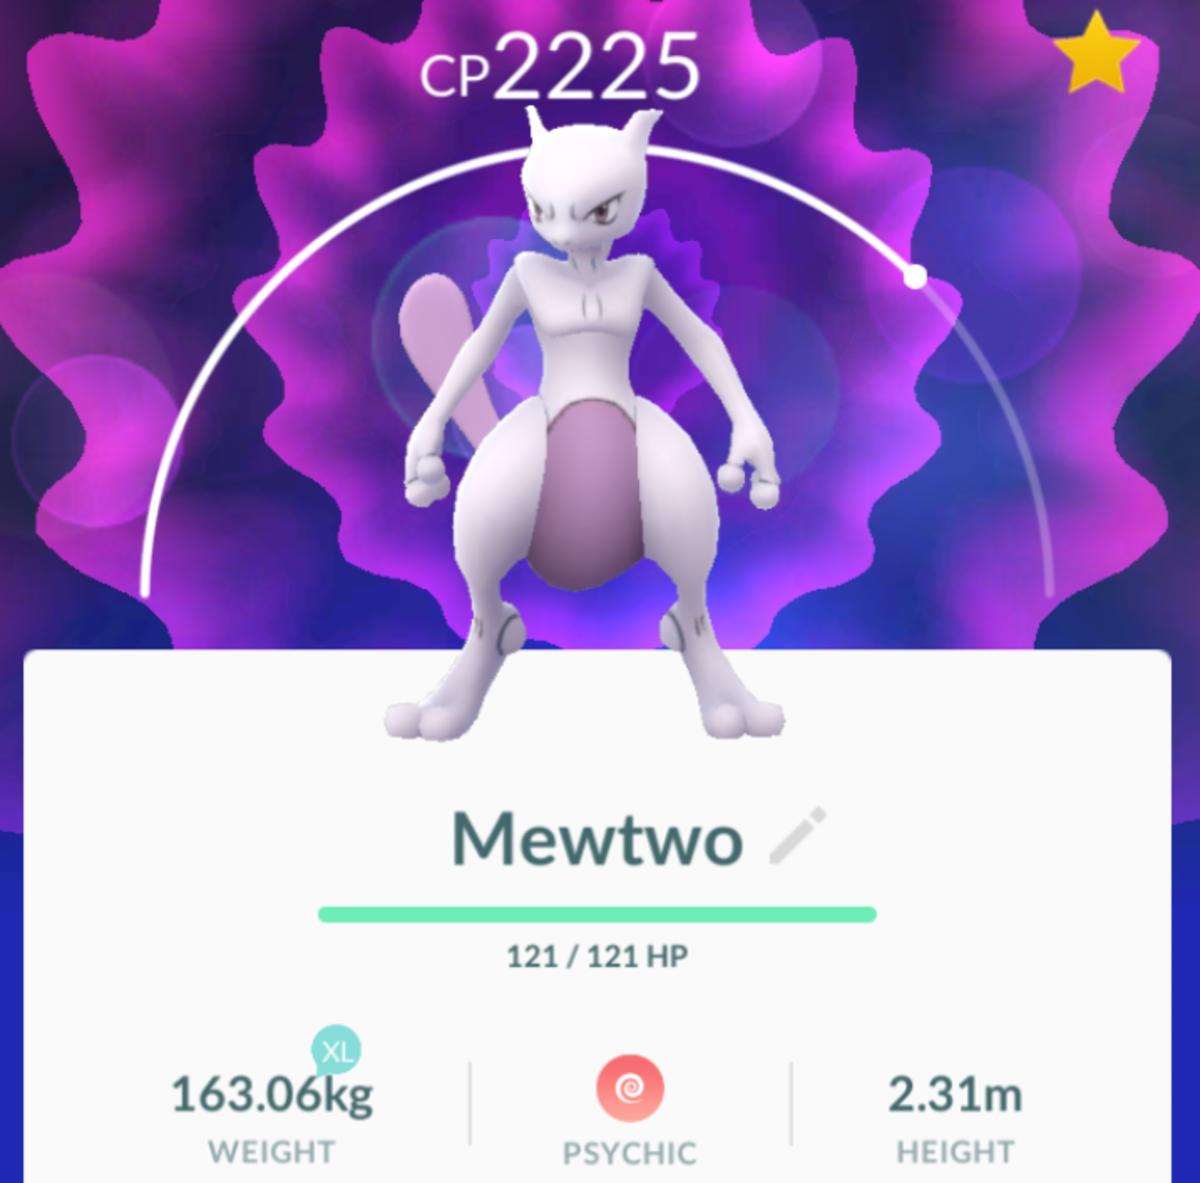 Mewtwo in Pokemon GO